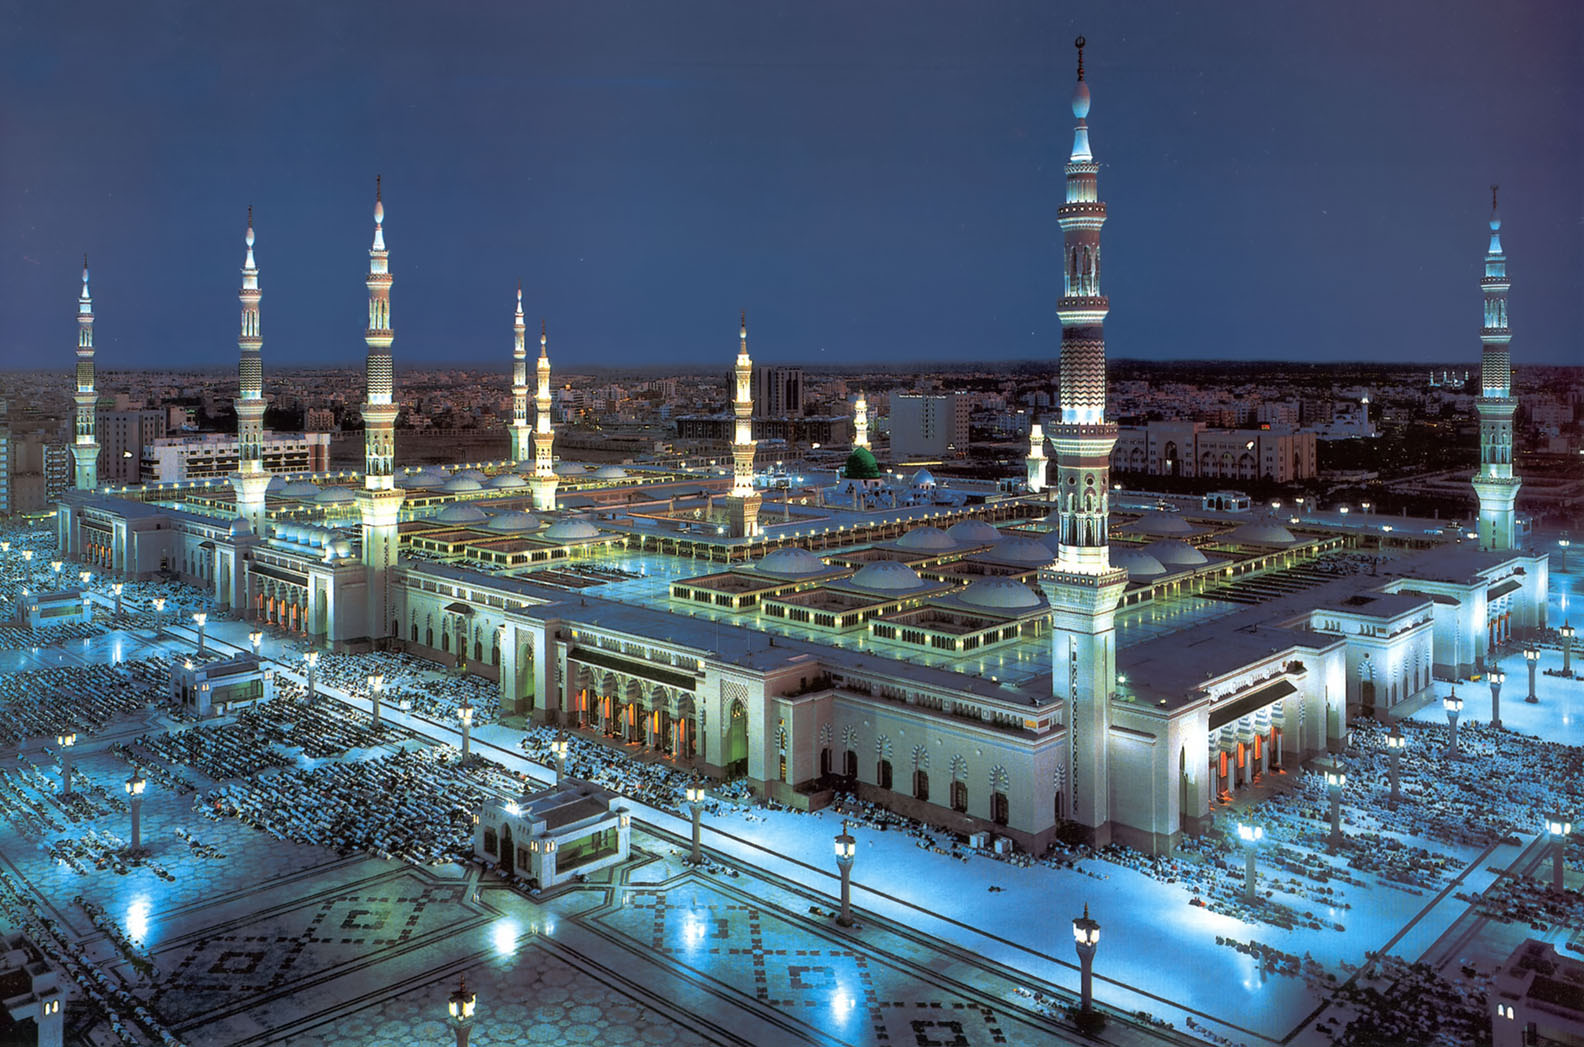 10 zbulime muslimane që ndryshuan botën